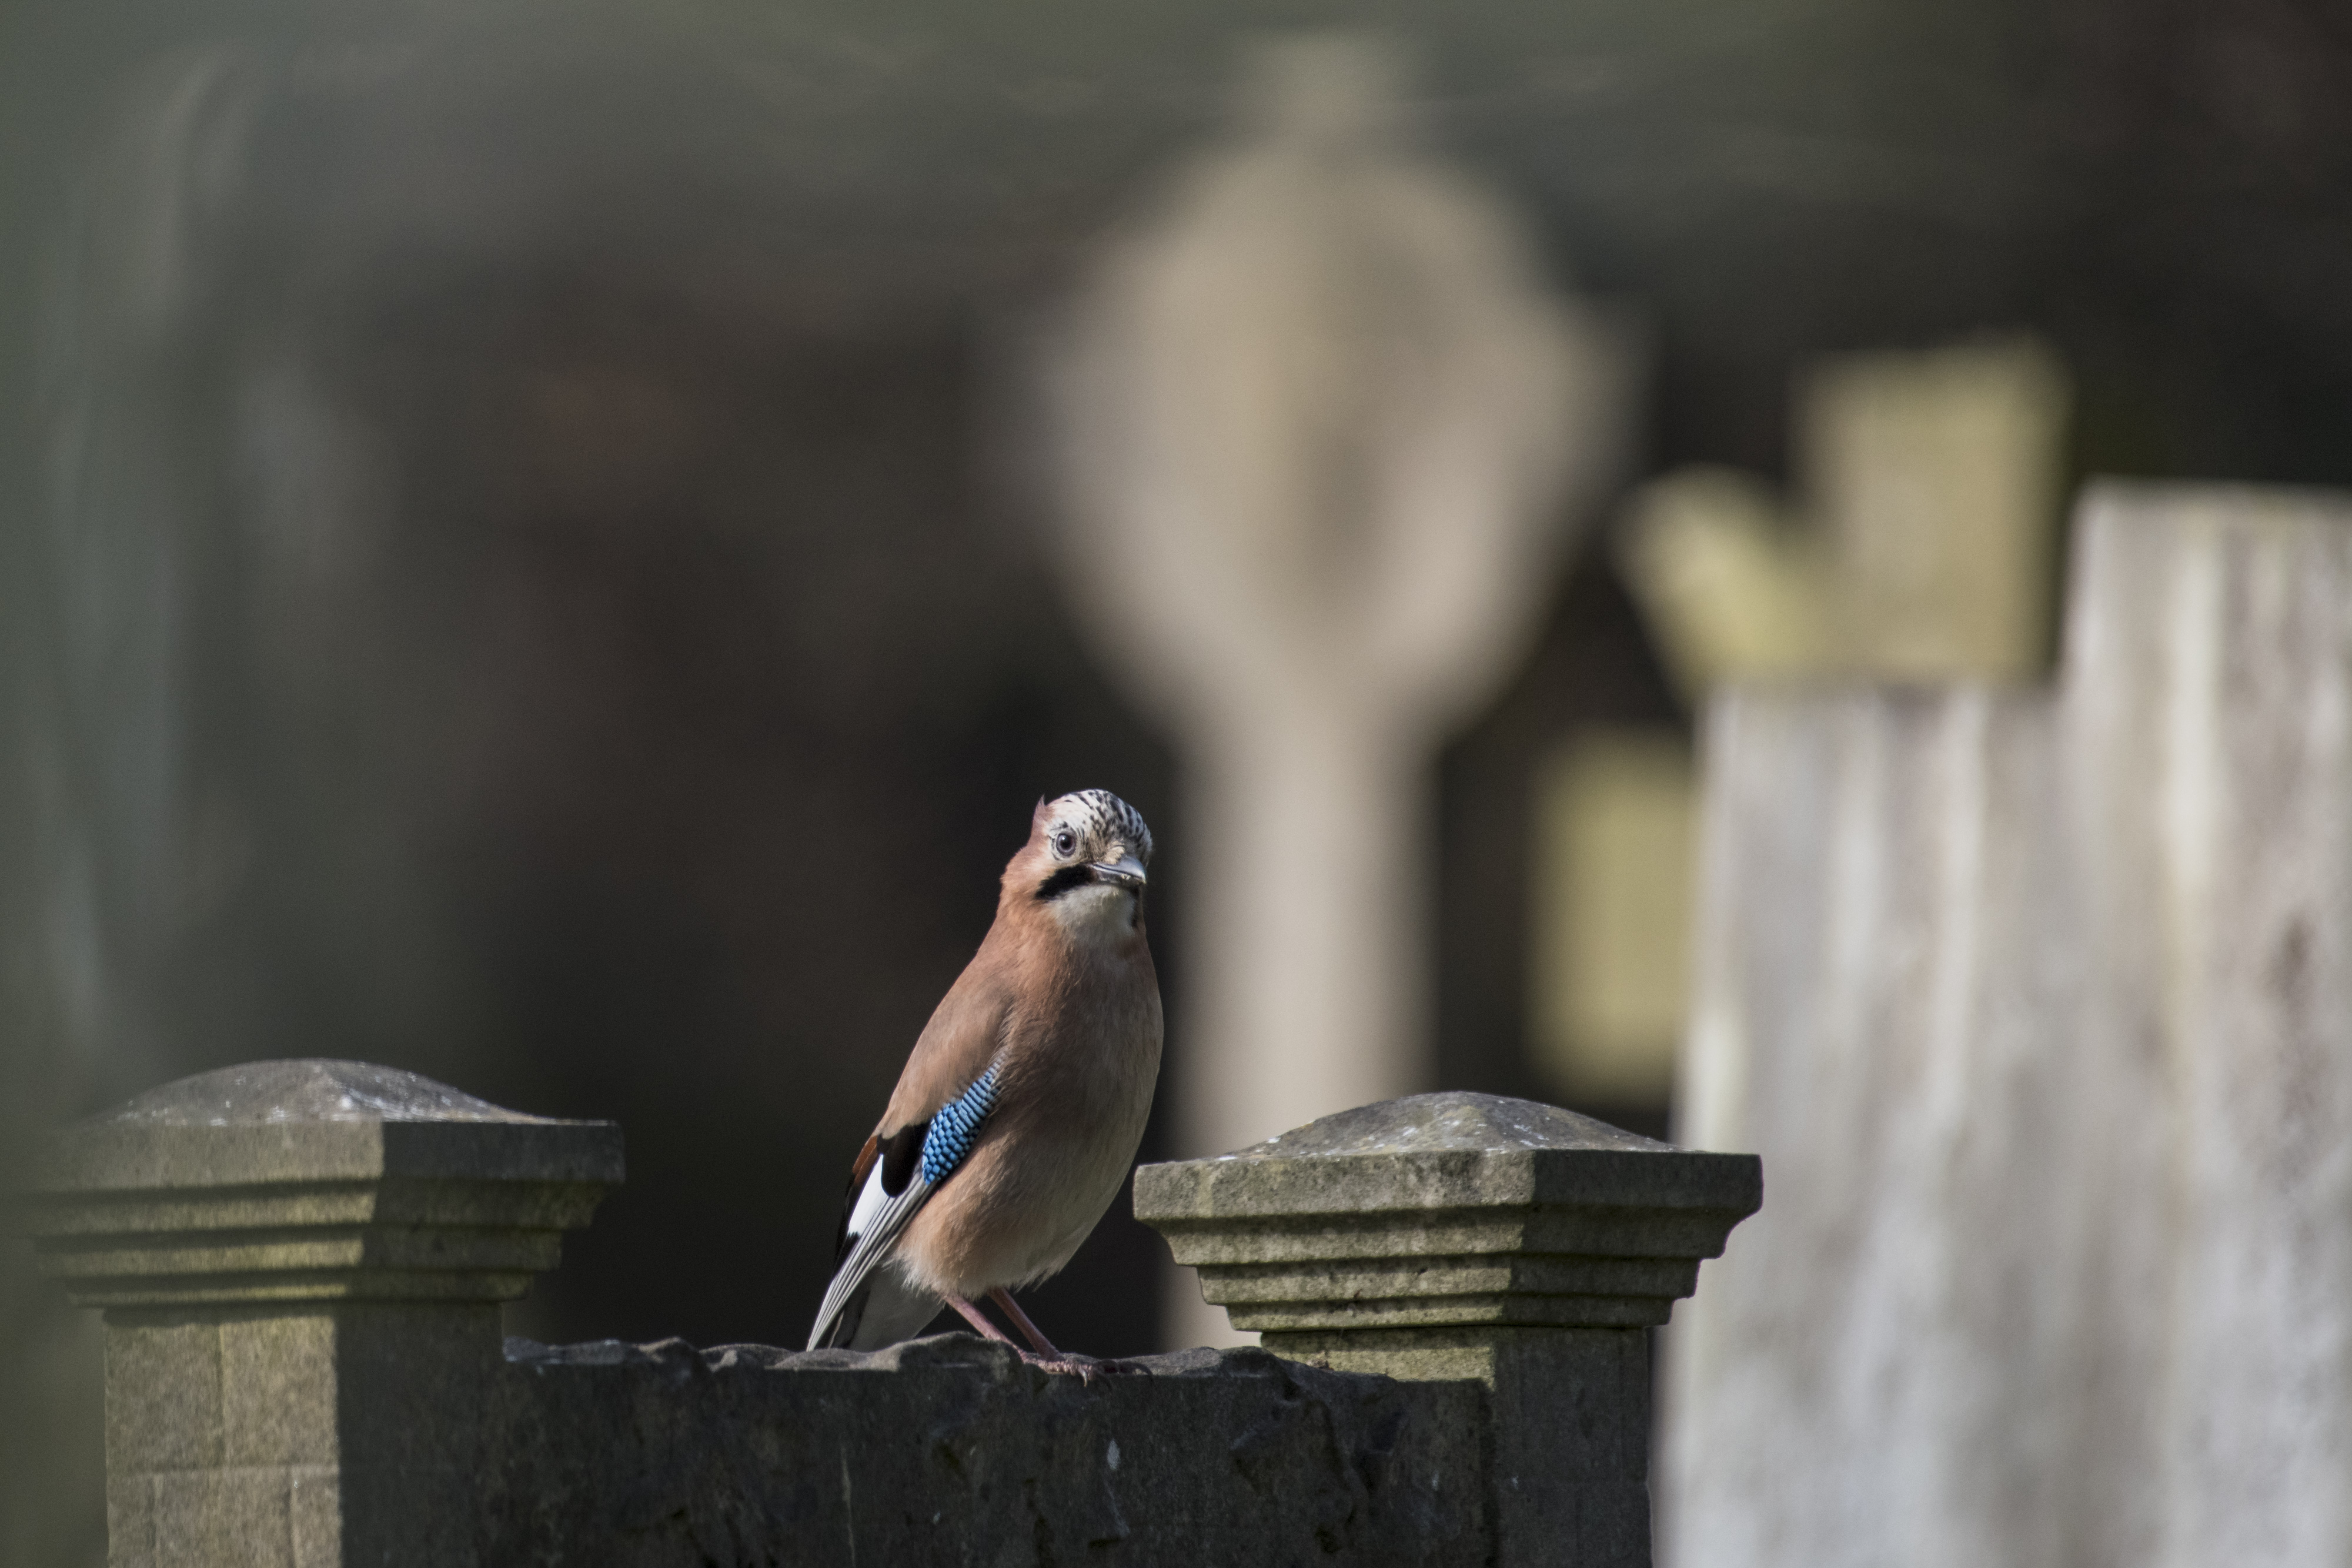 Bird in a graveyard